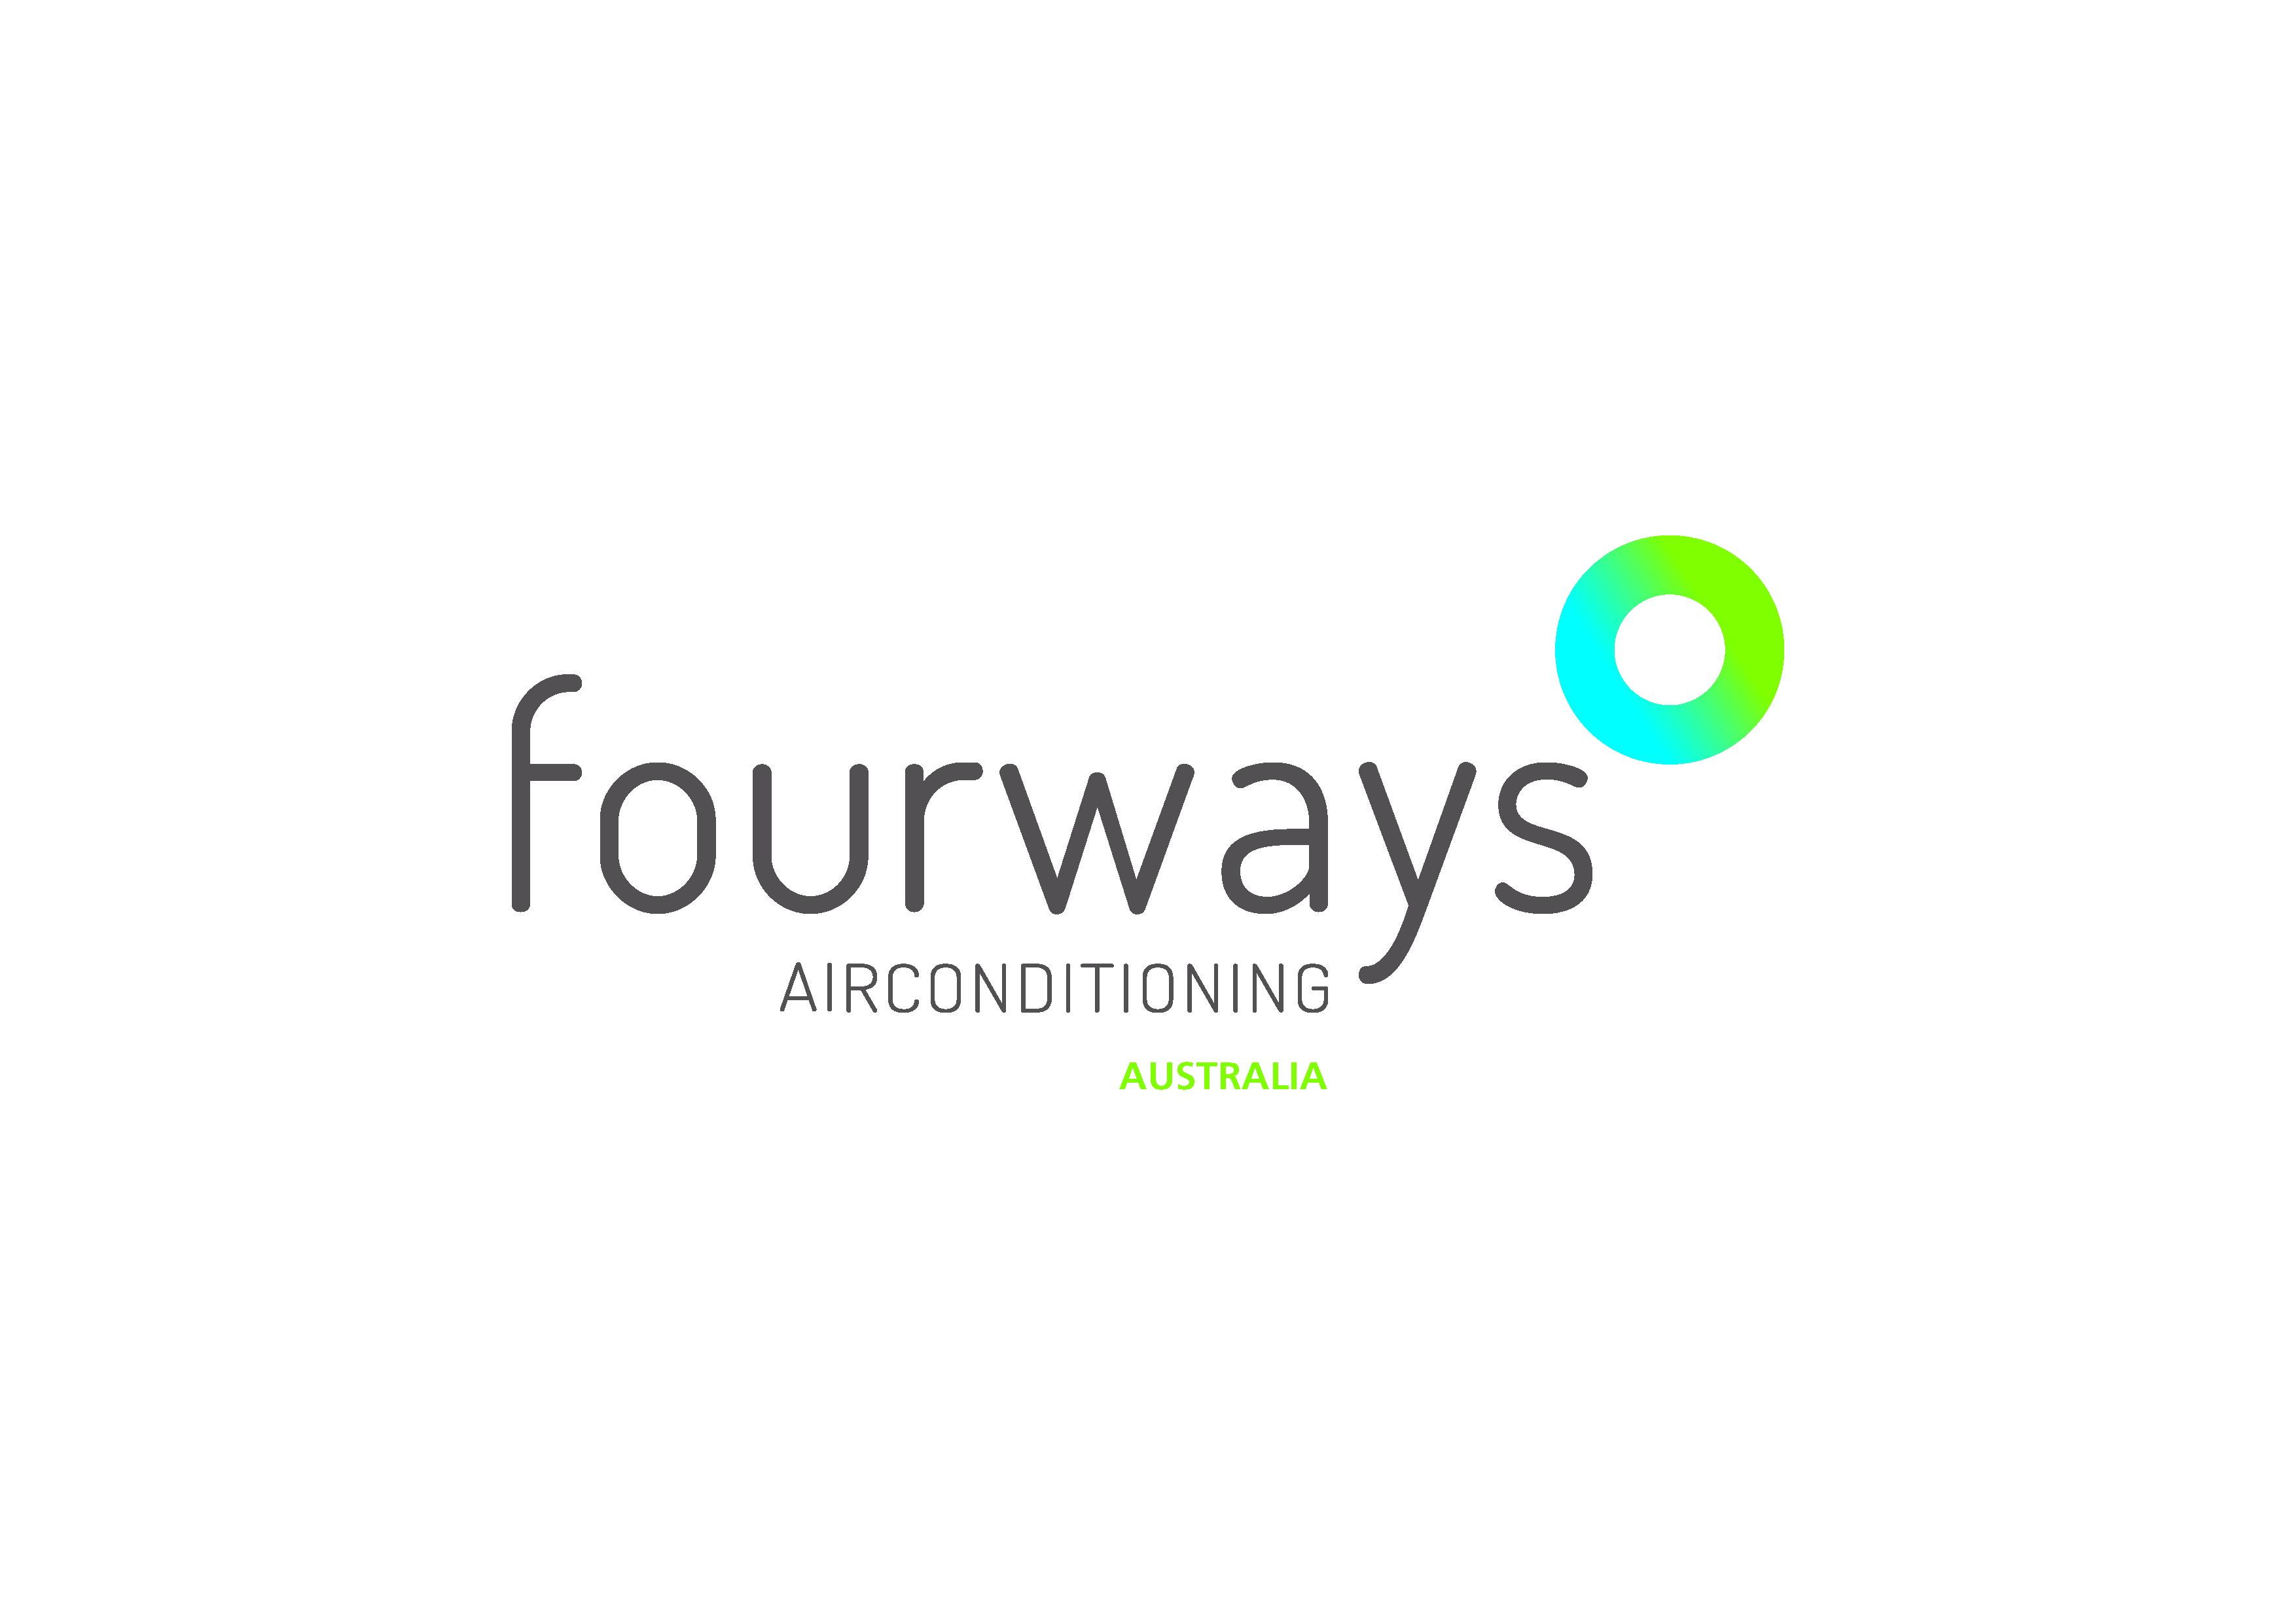 Fourways Airconditioning Australia